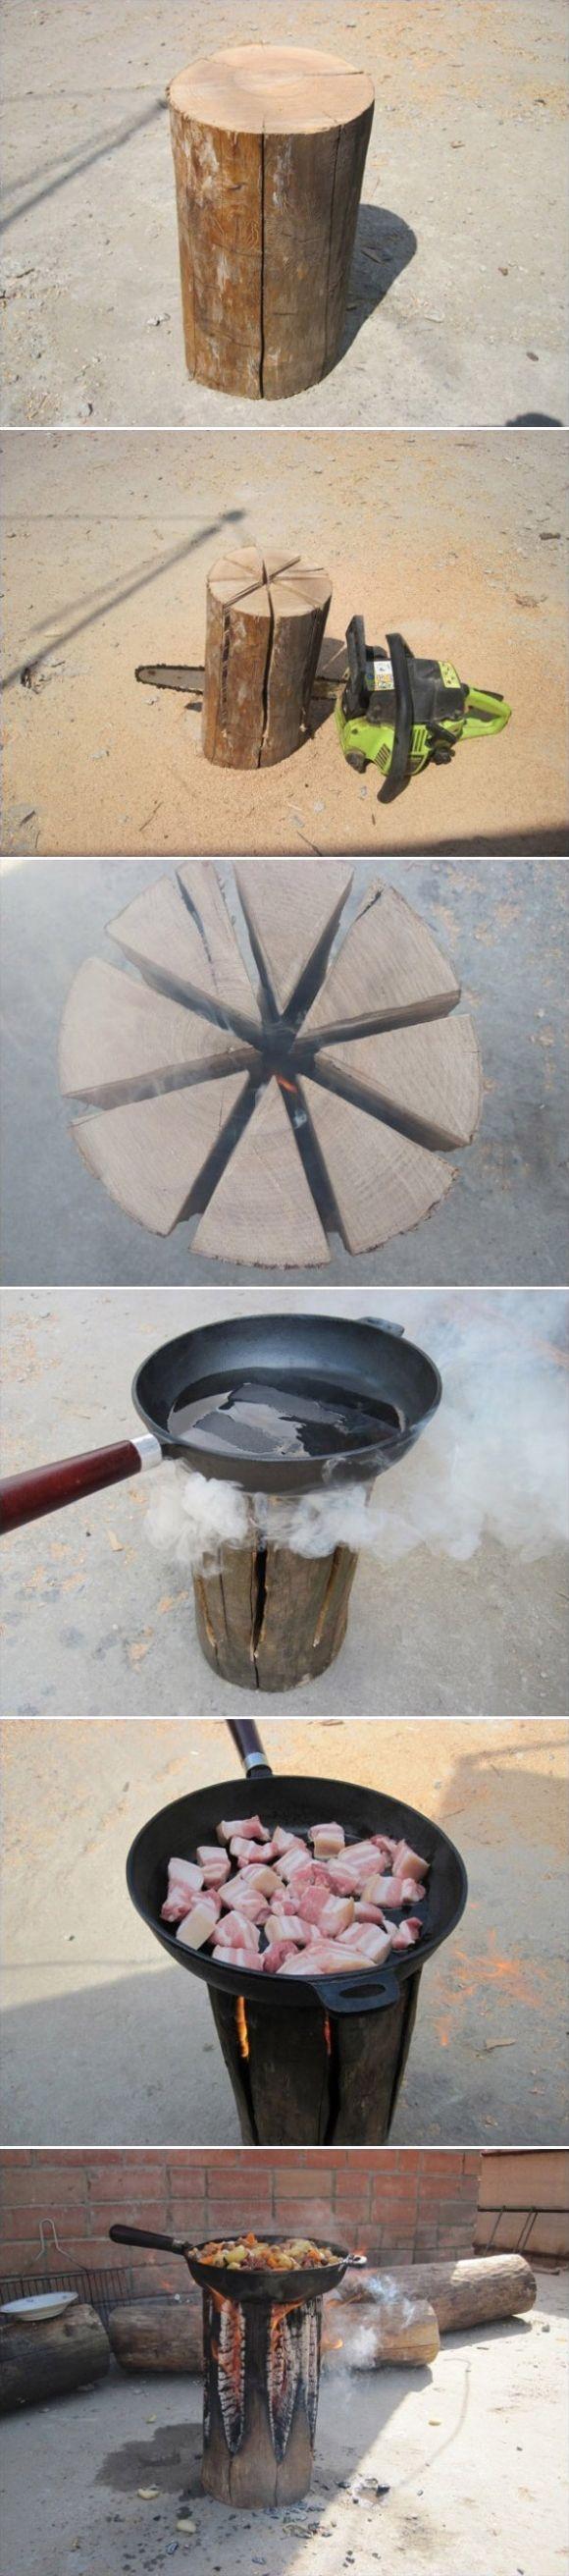 180 best outdoor fire images on pinterest outdoor fire rocket